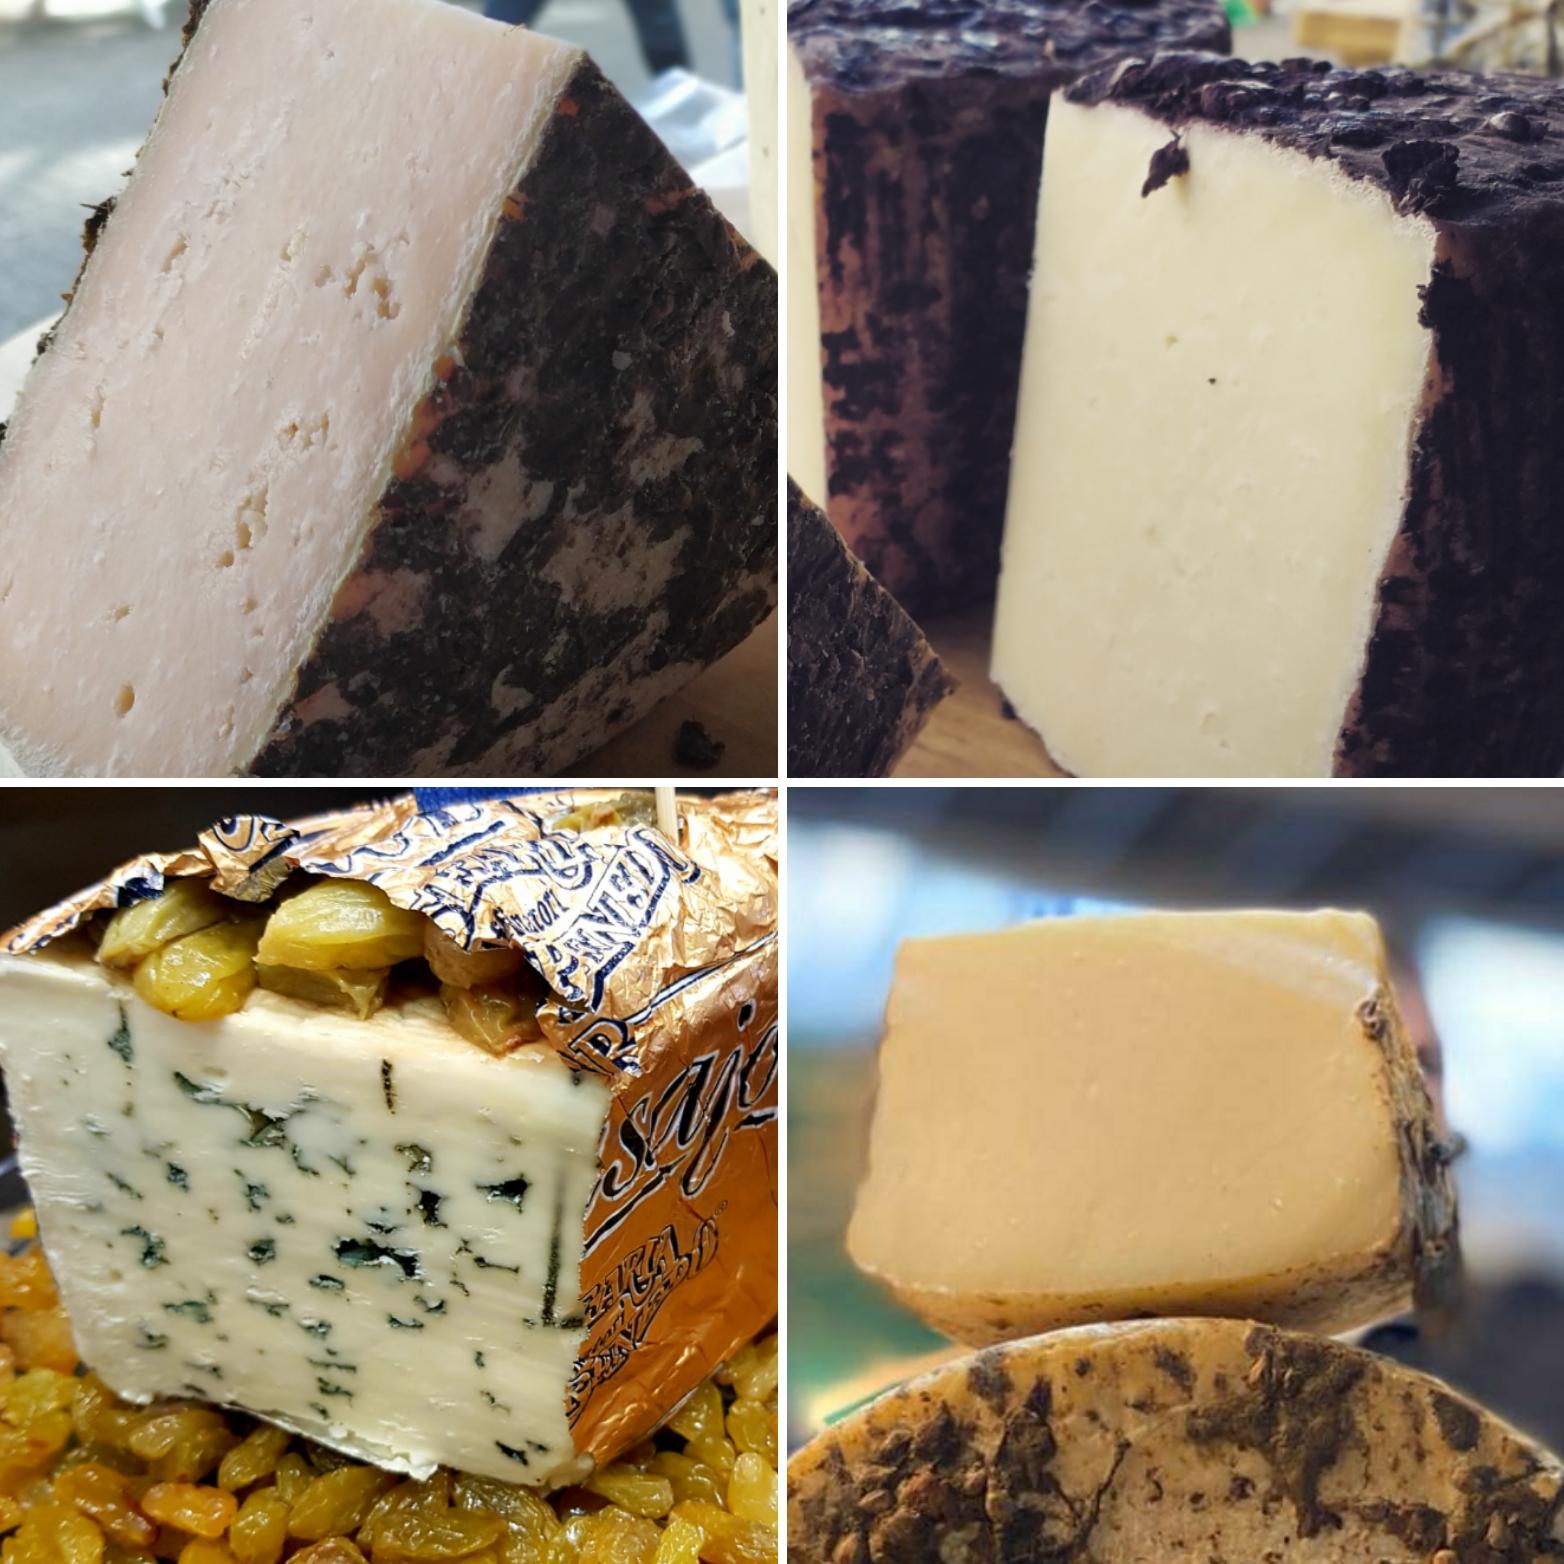 Cheese made of non-cow milk composite